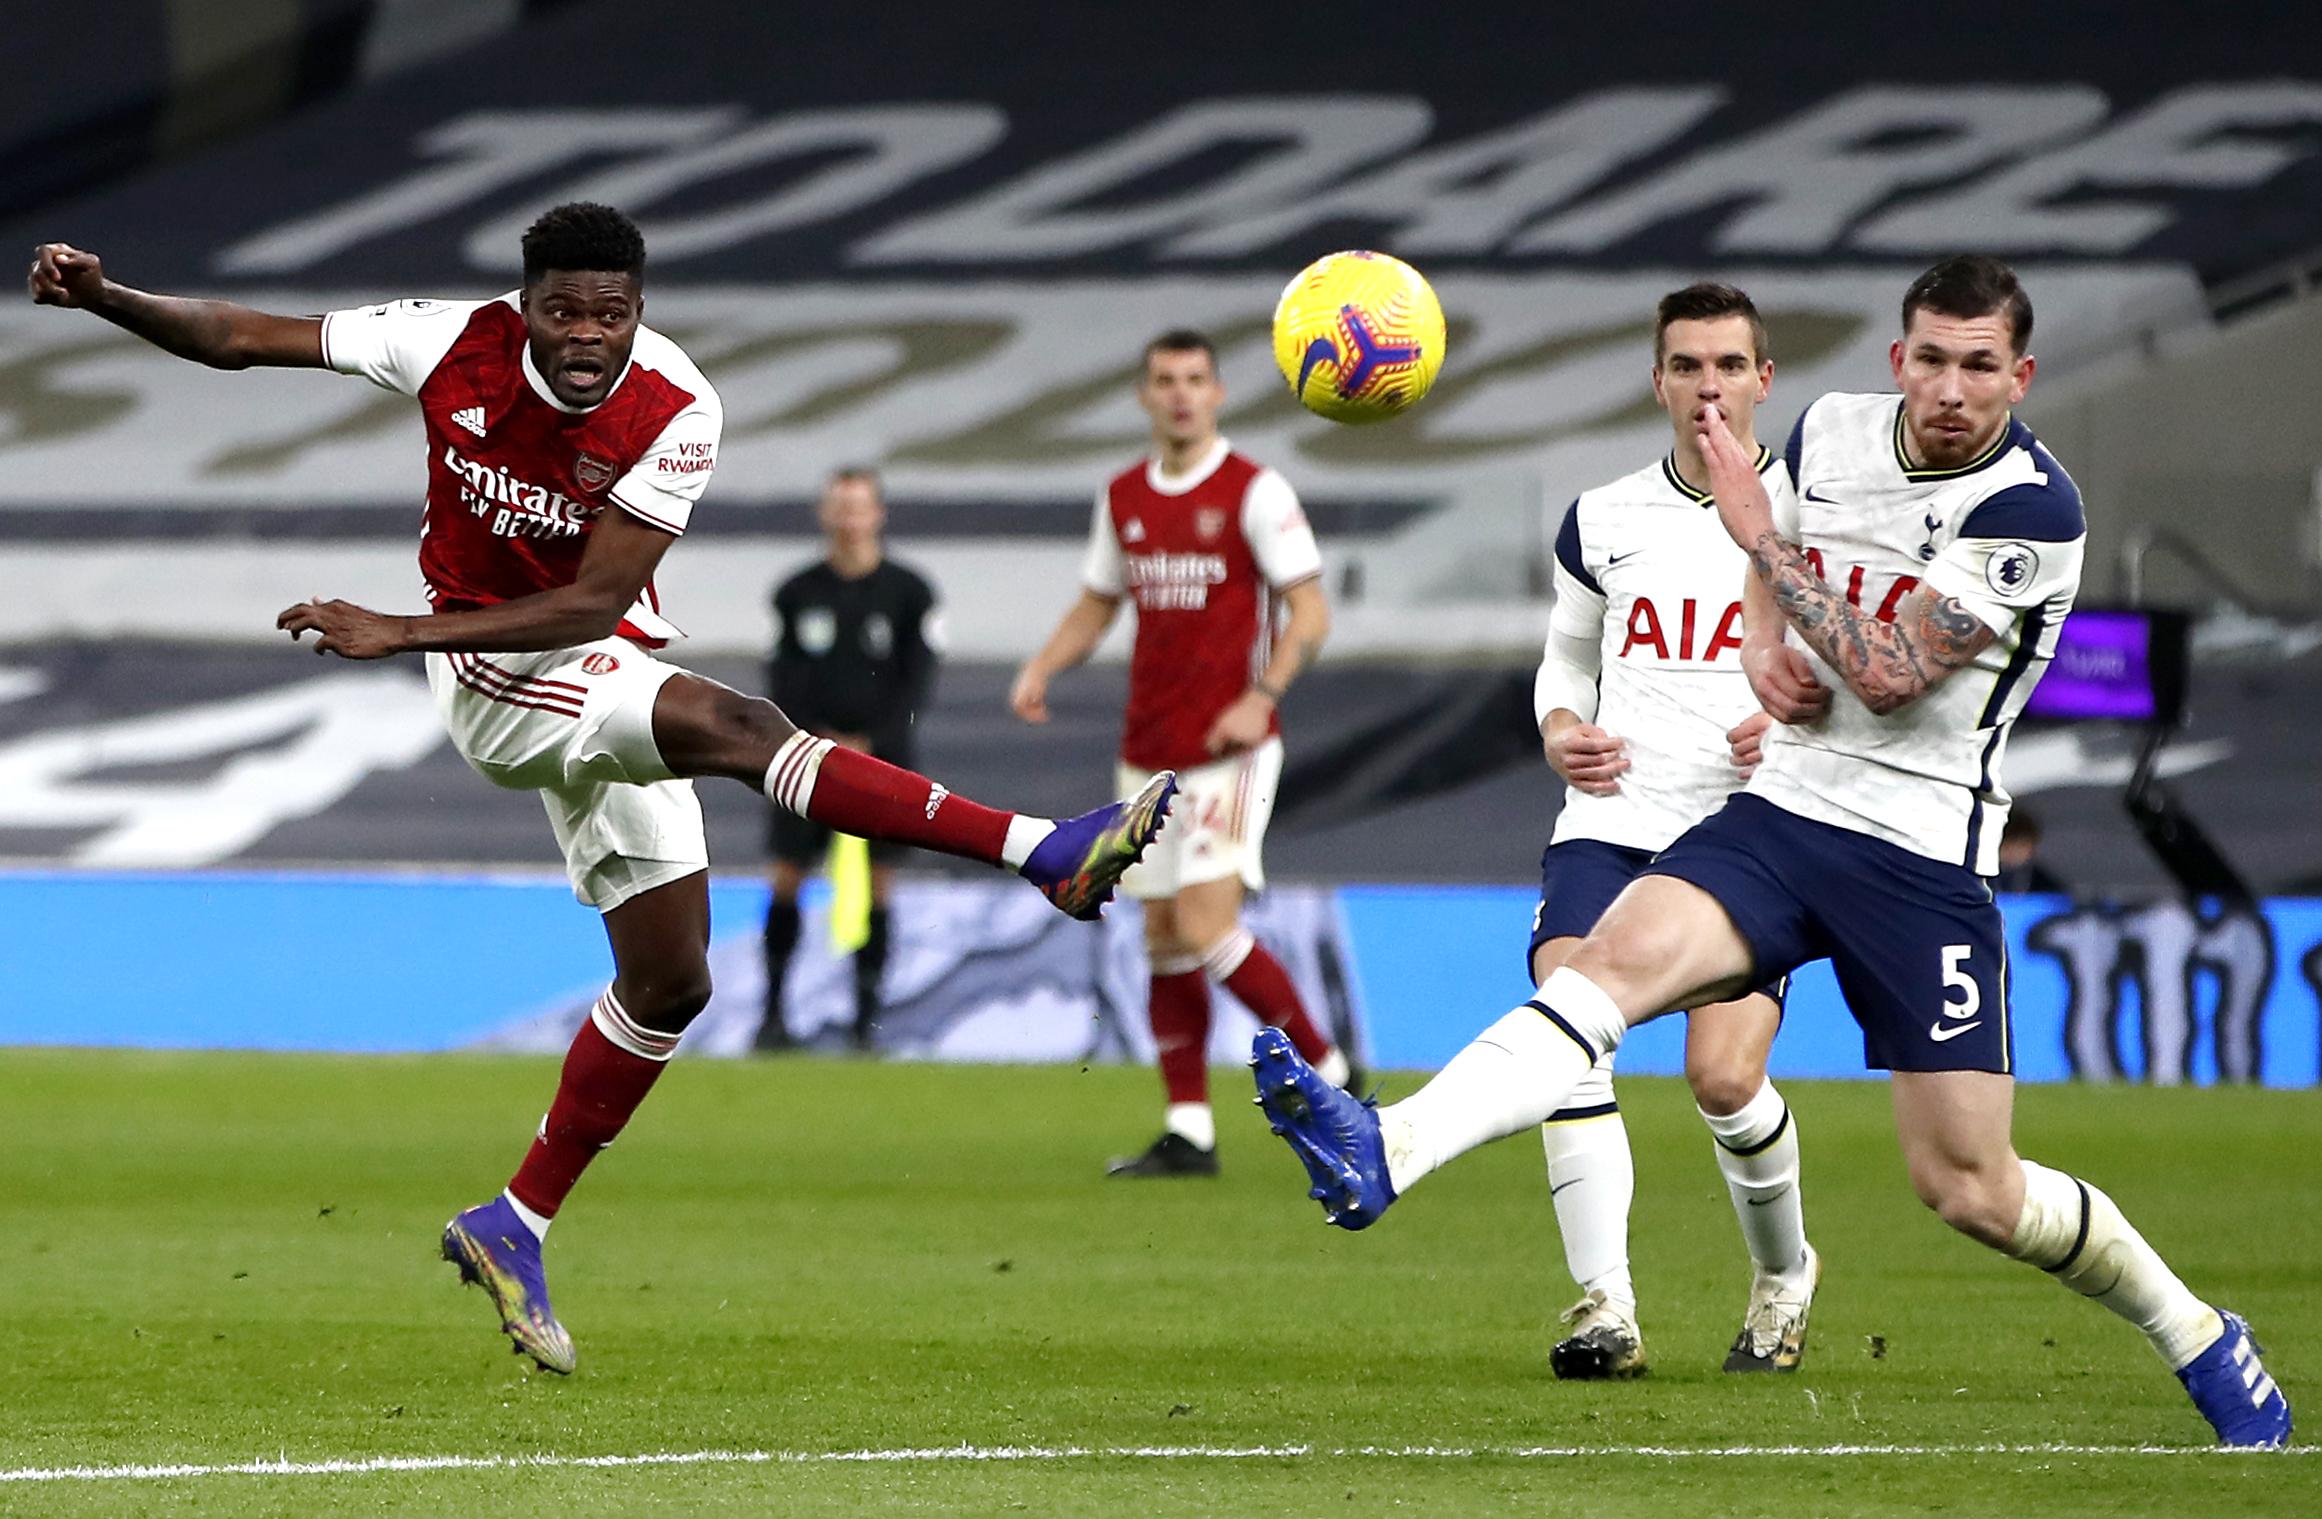 Tottenham Hotspur v Arsenal - Premier League - Tottenham Hotspur Stadium